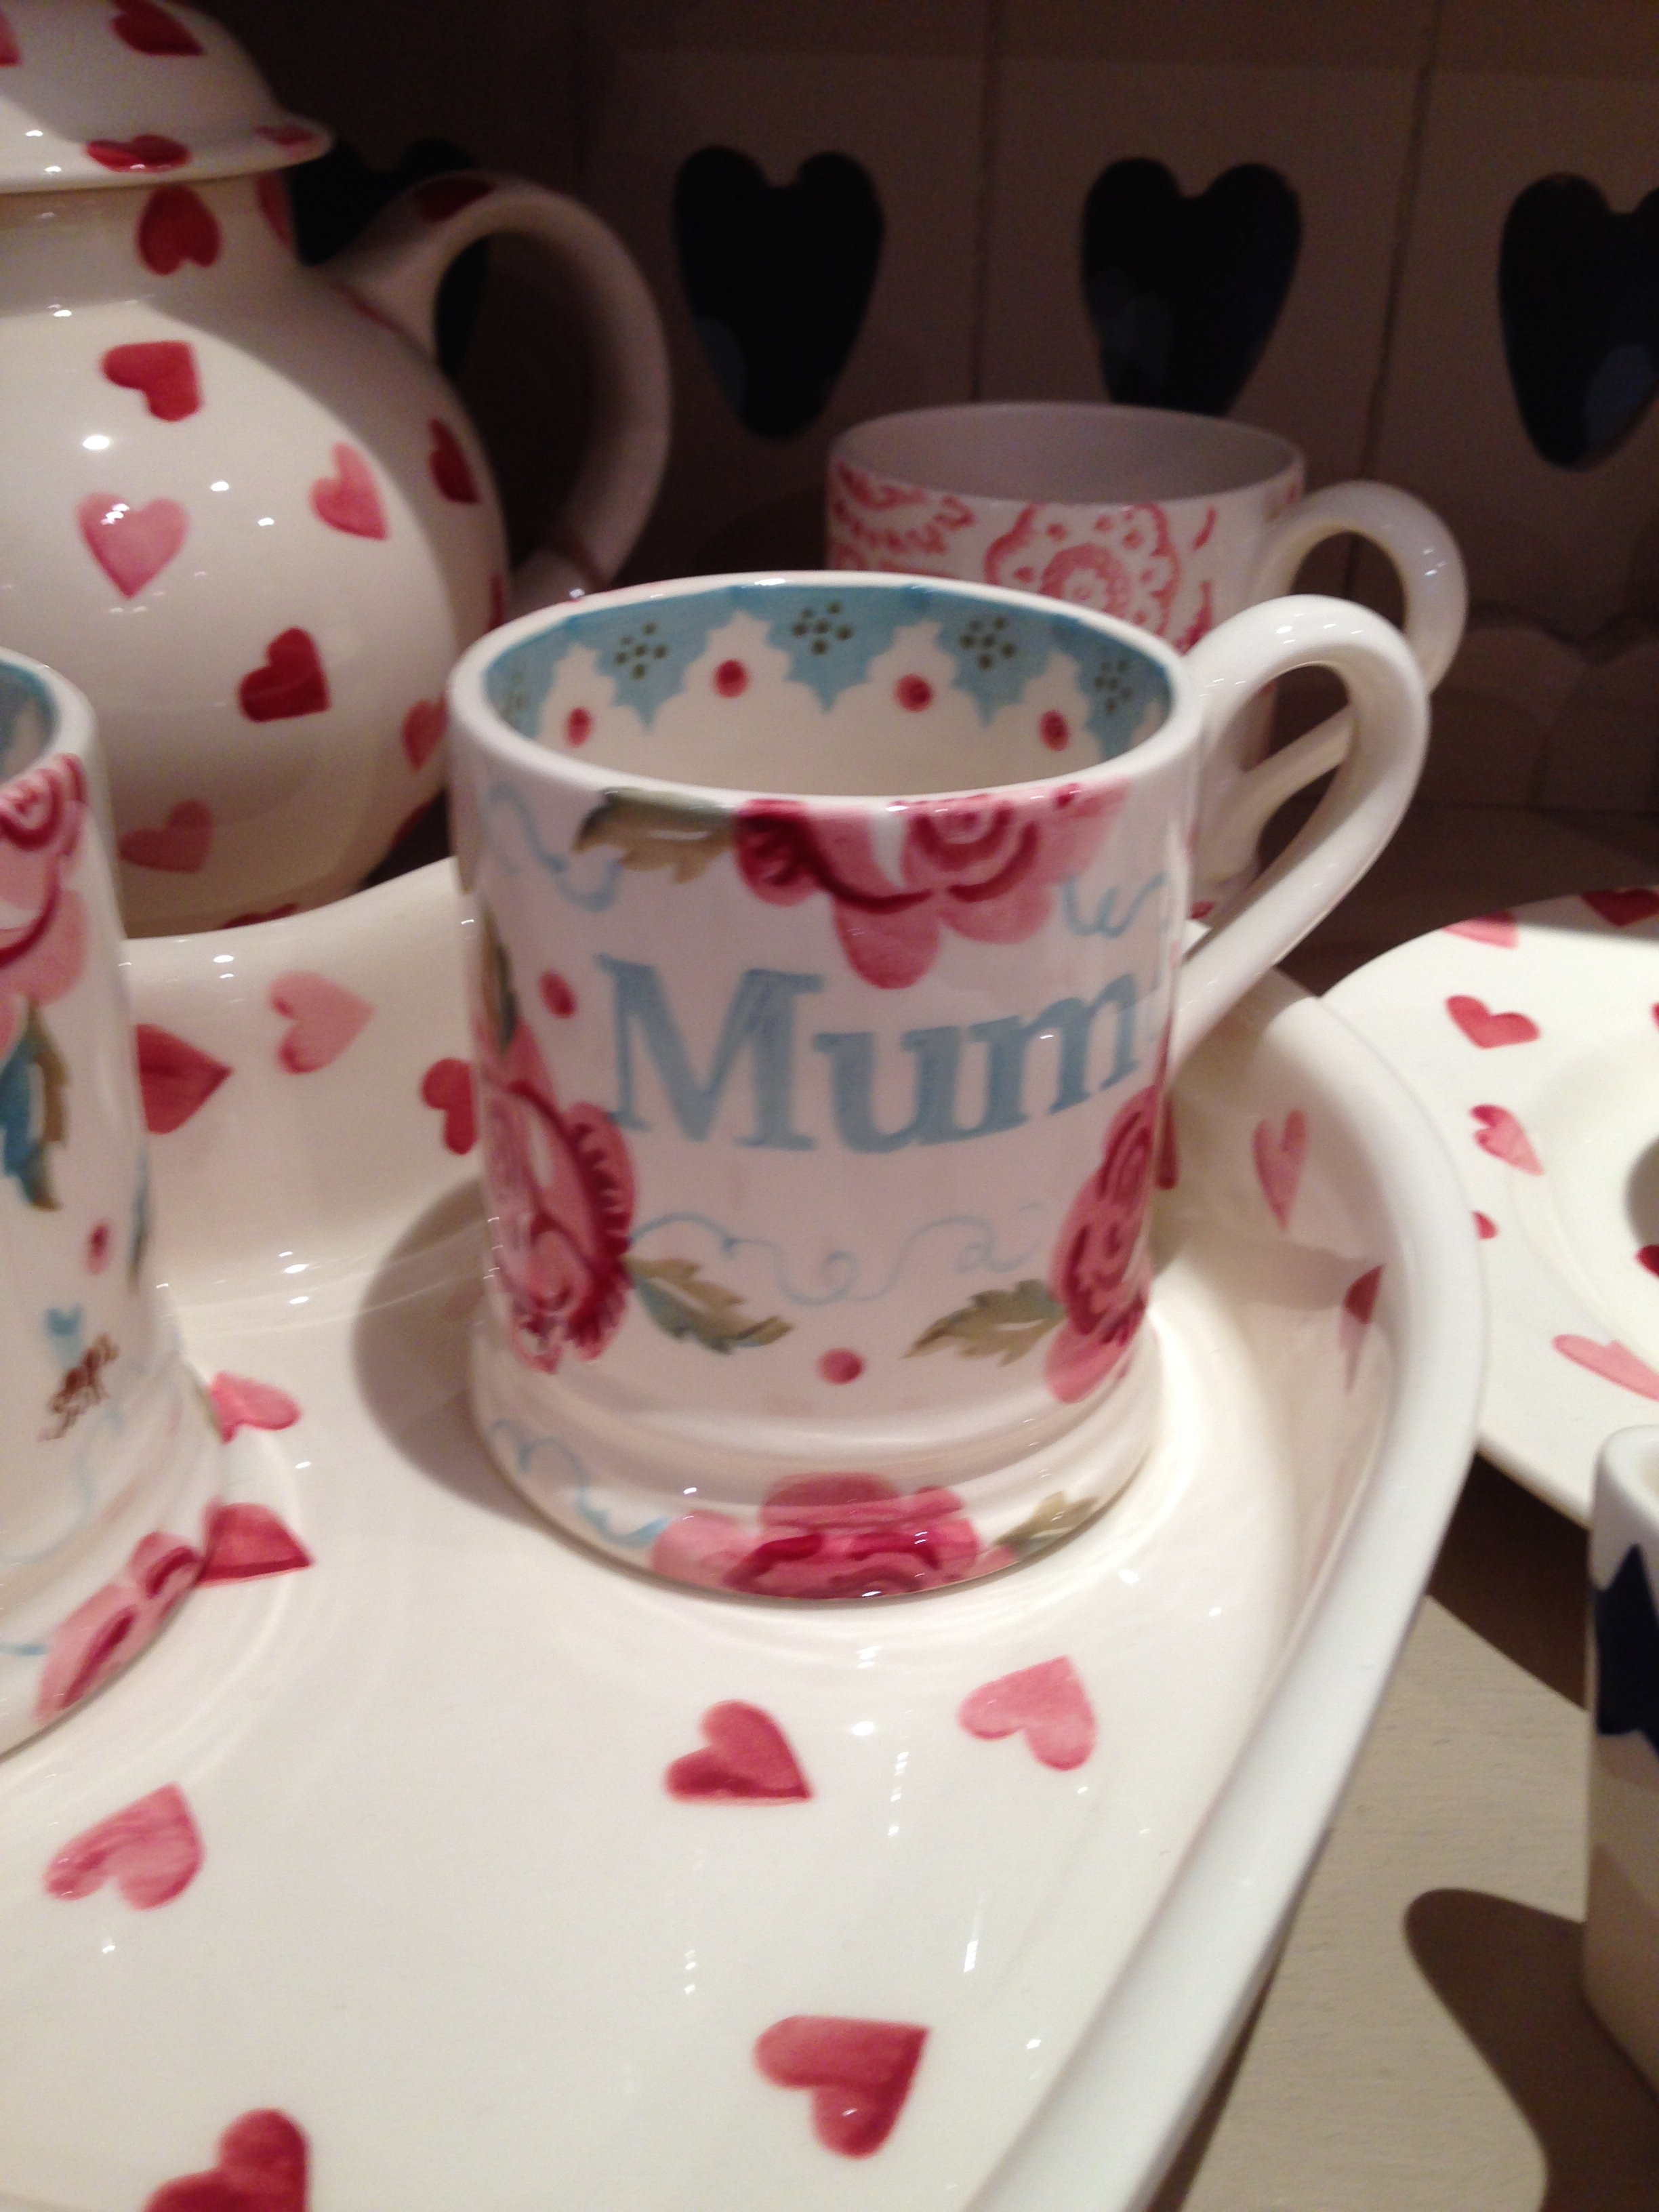 Emma Bridgewater Mum Mug